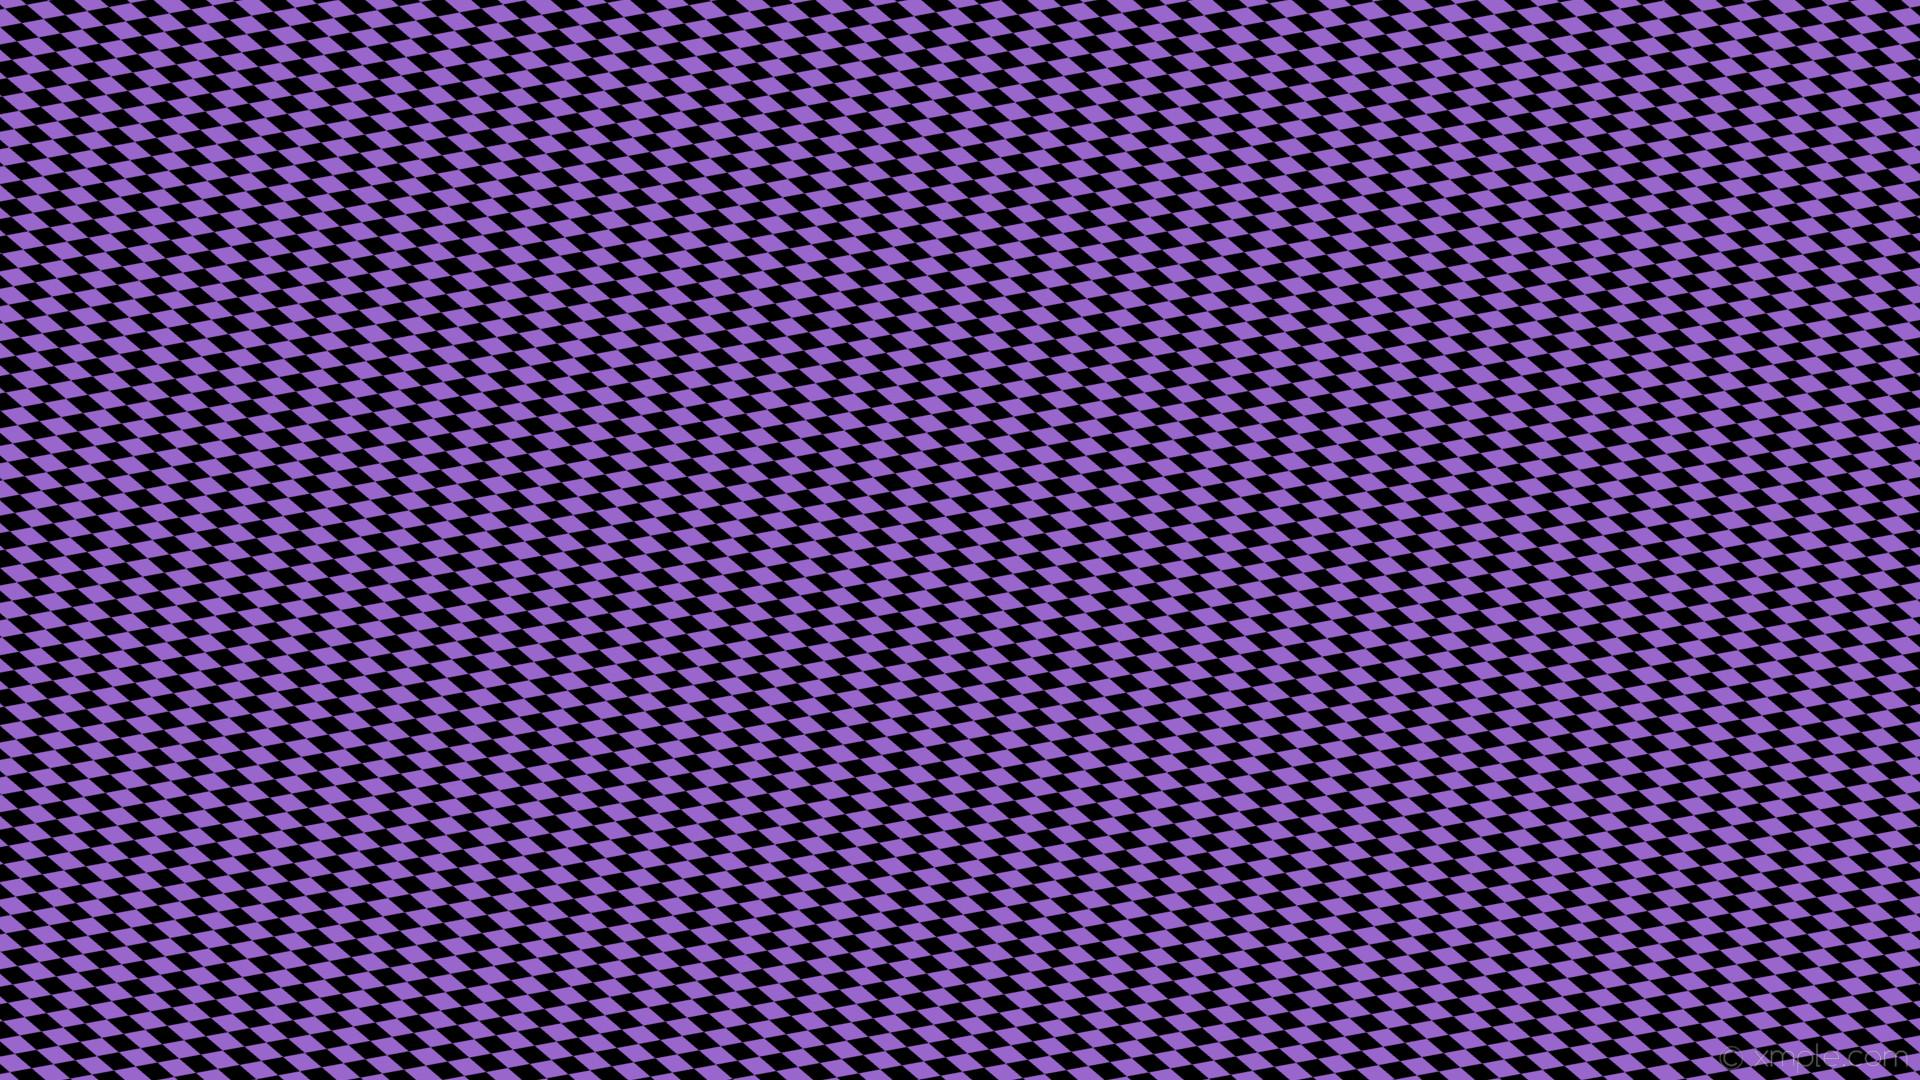 wallpaper lozenge black purple diamond rhombus amethyst #000000 #9966cc  165° 40px 19px